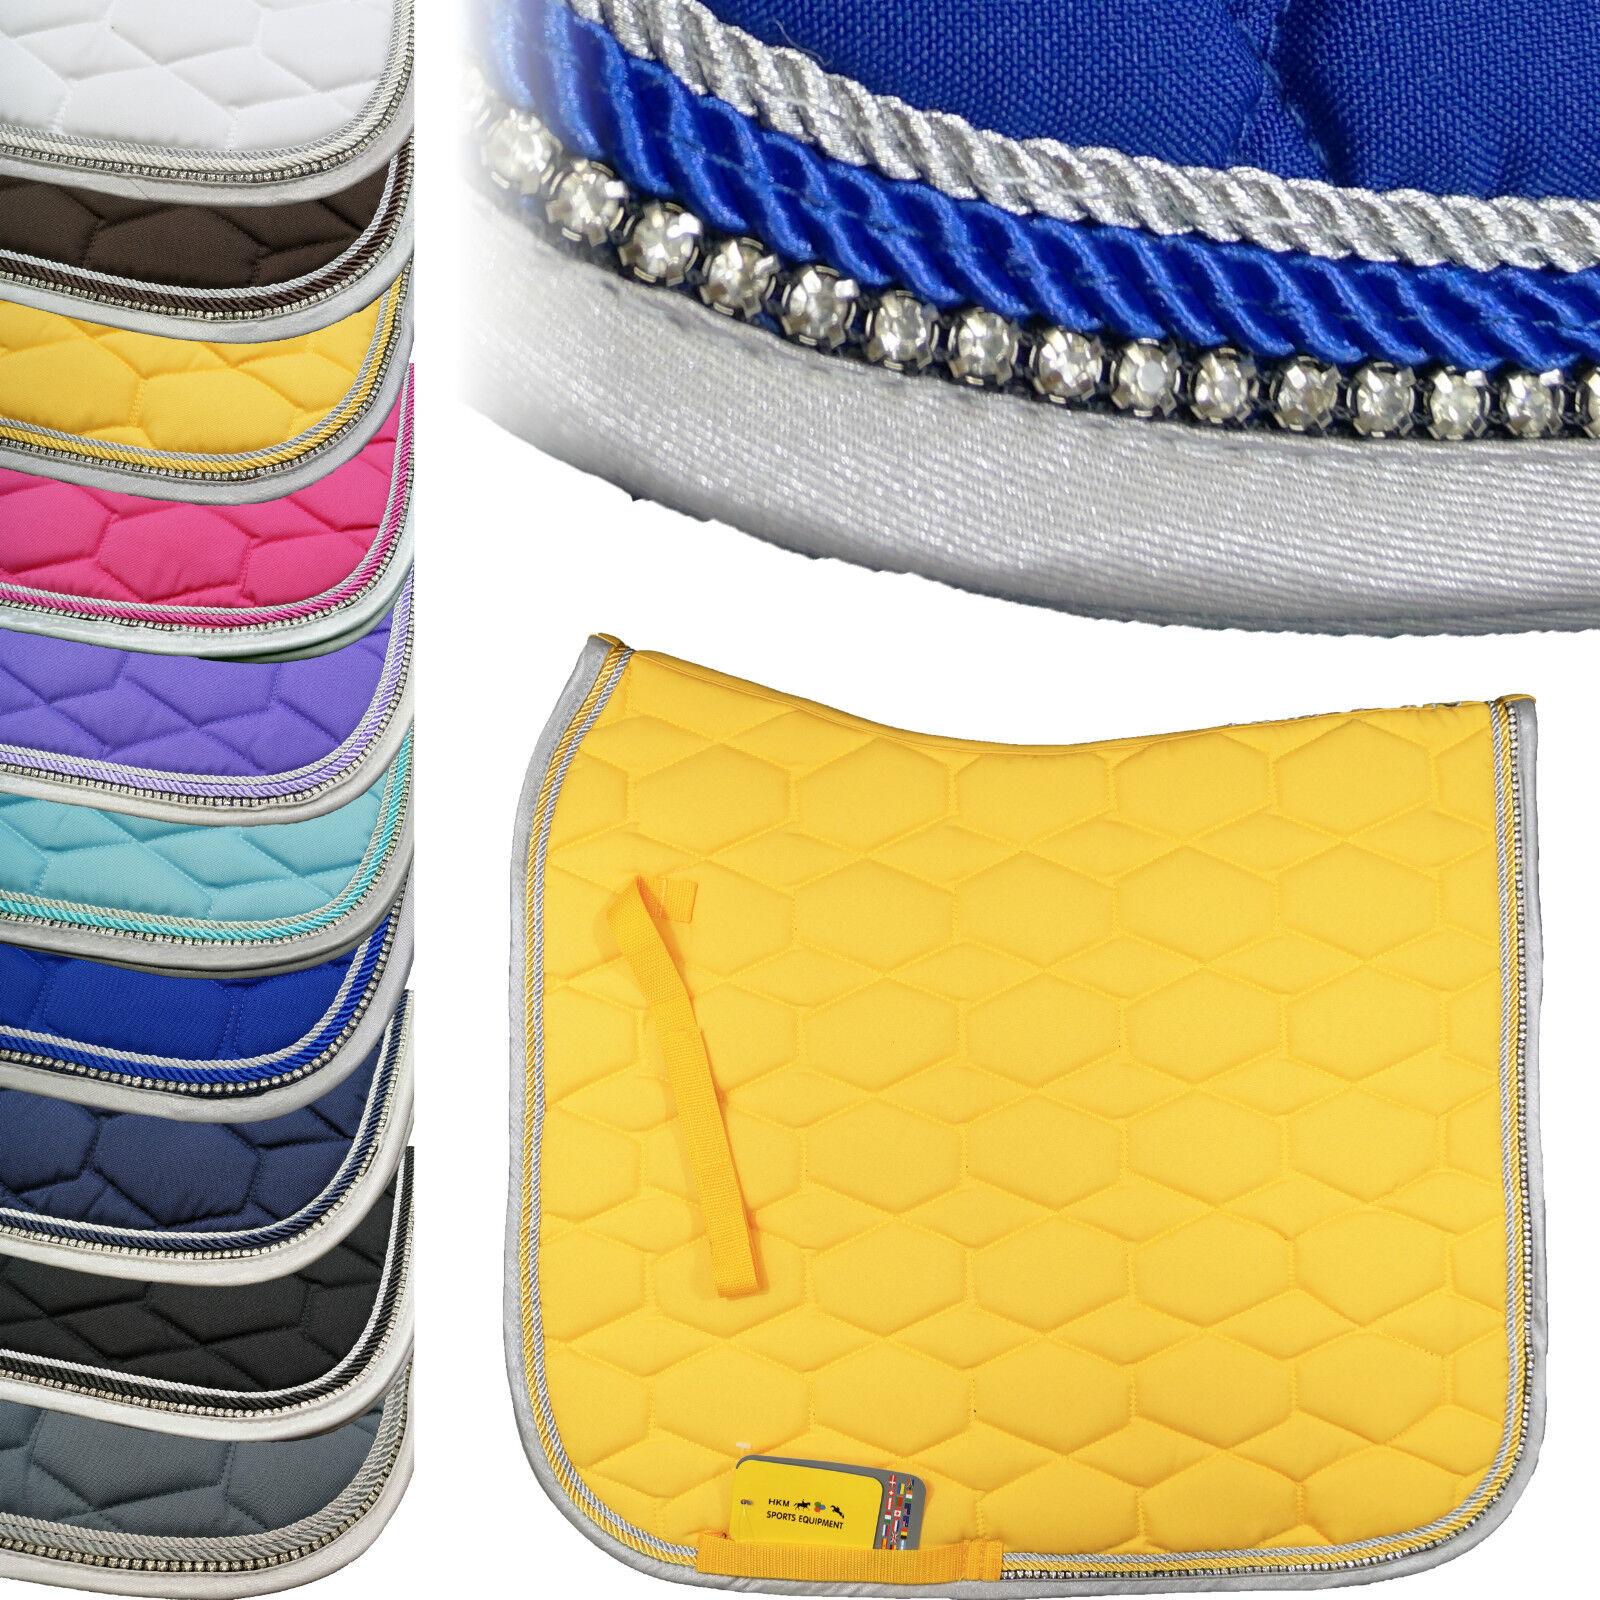 HKM Saddlecloth Crystal Fashion with Rhinestone (9125)